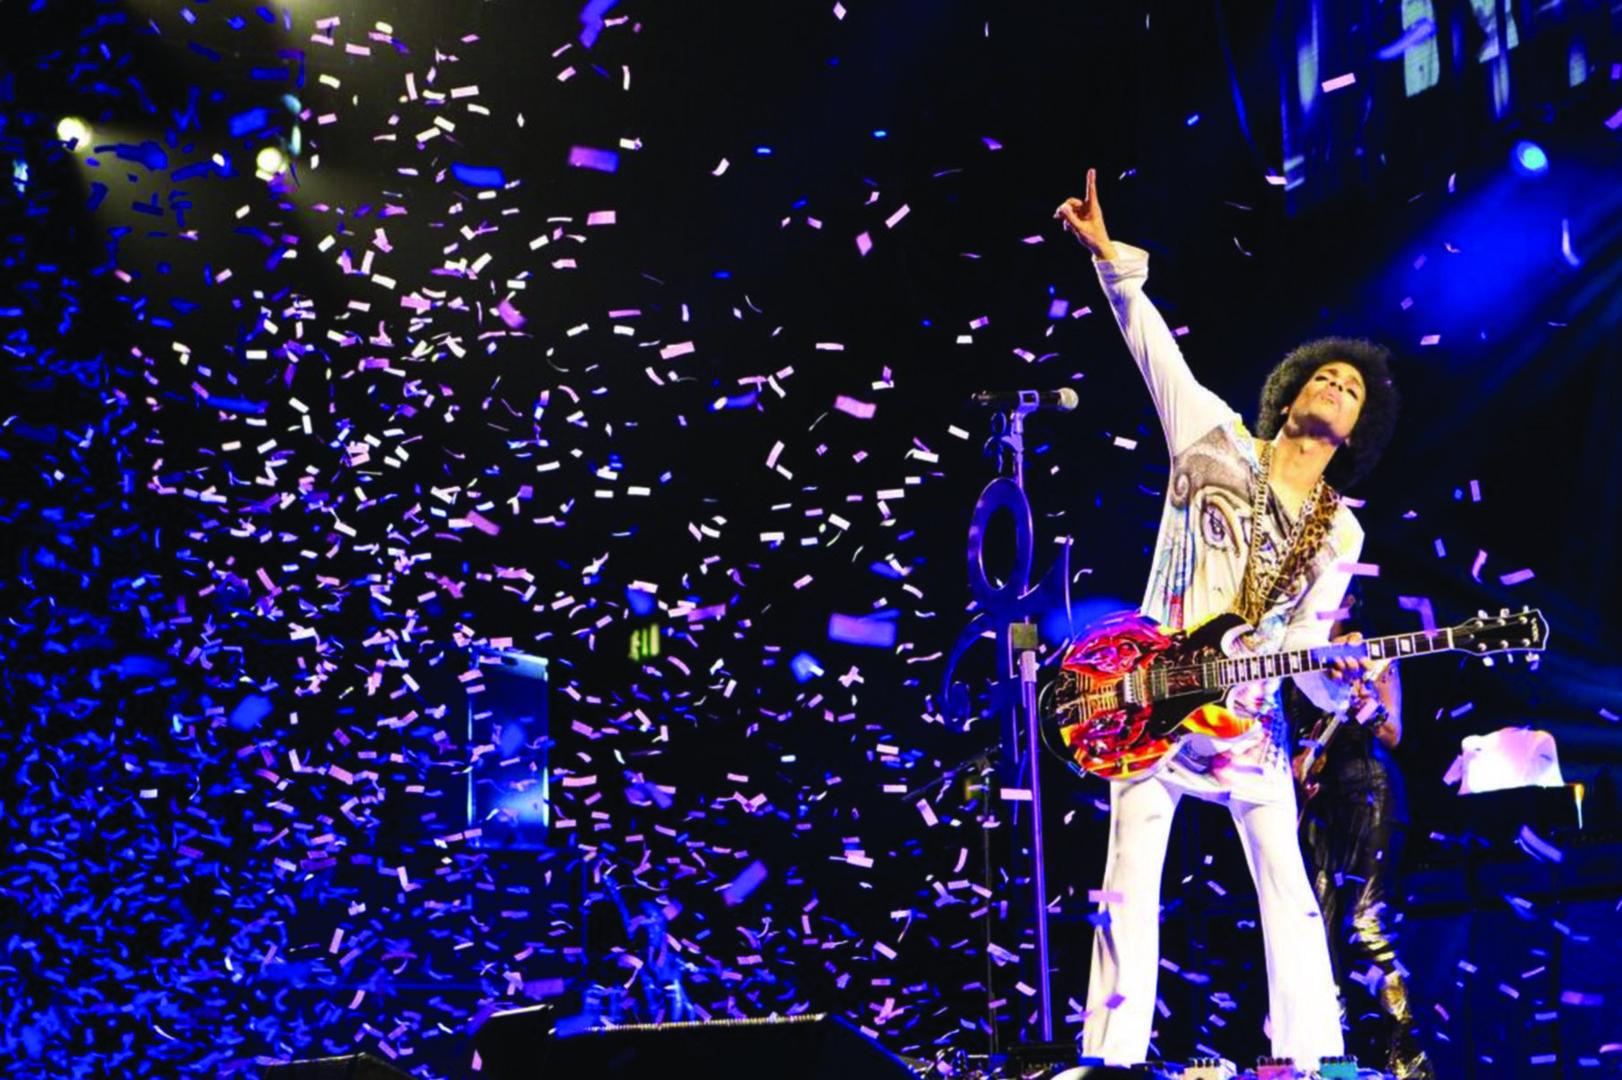 Prince_Prince_Live promo